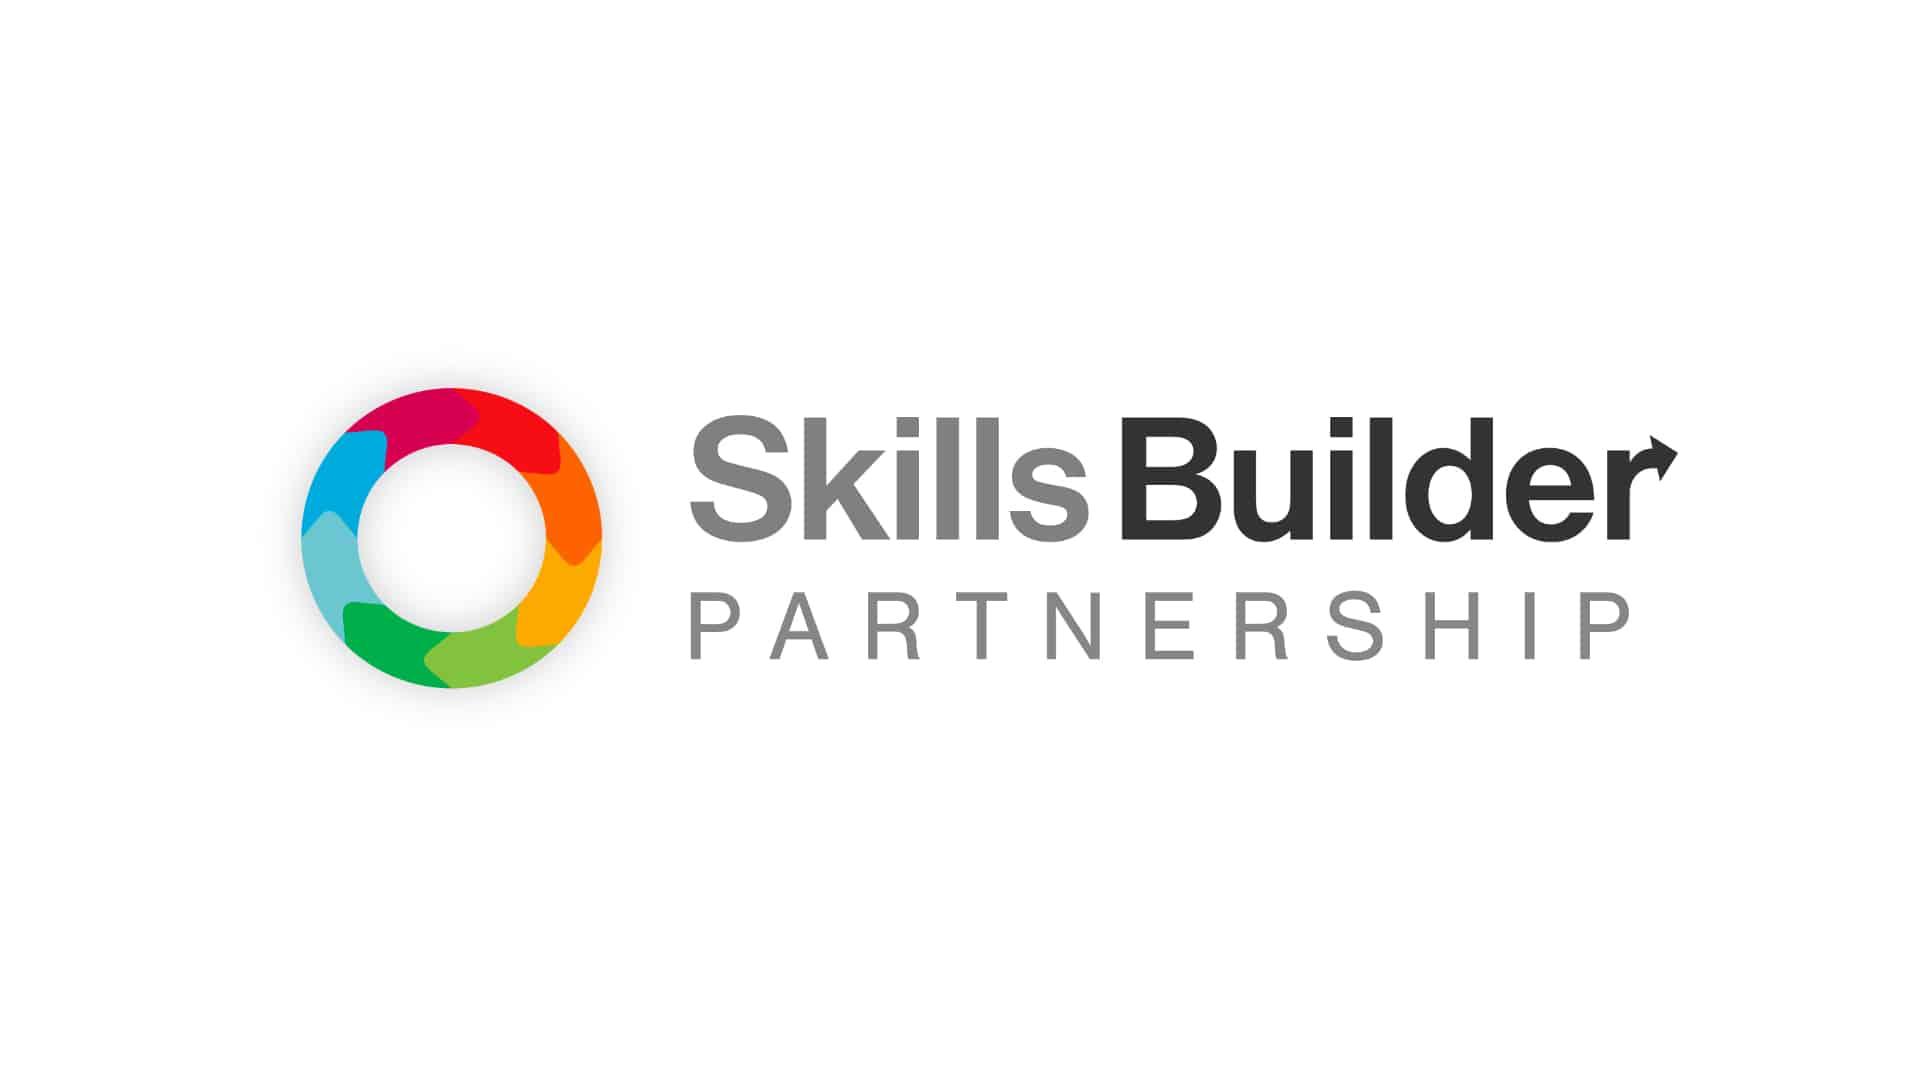 'Building a Skills Continuum: the Skills Builder model'